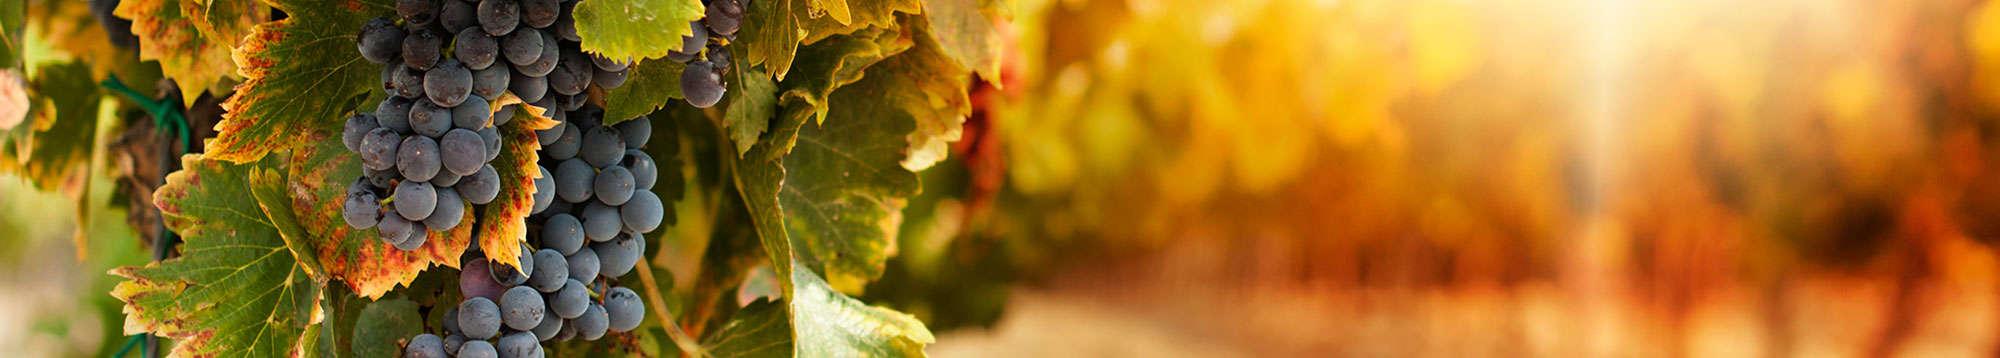 Escapadas fin de semana Ruta de vinos en Italia